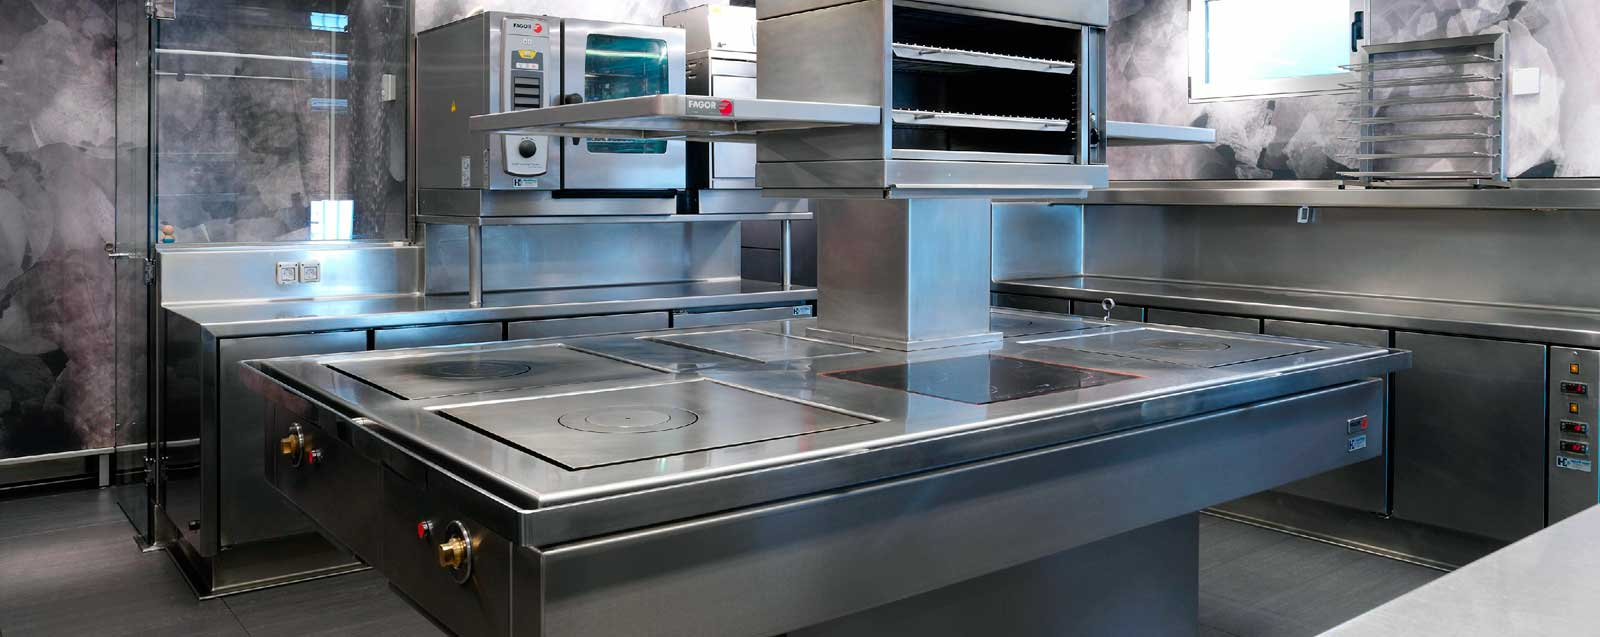 Muy dulces maquinaria de cocina de segunda mano for Buscar cocinas de segunda mano